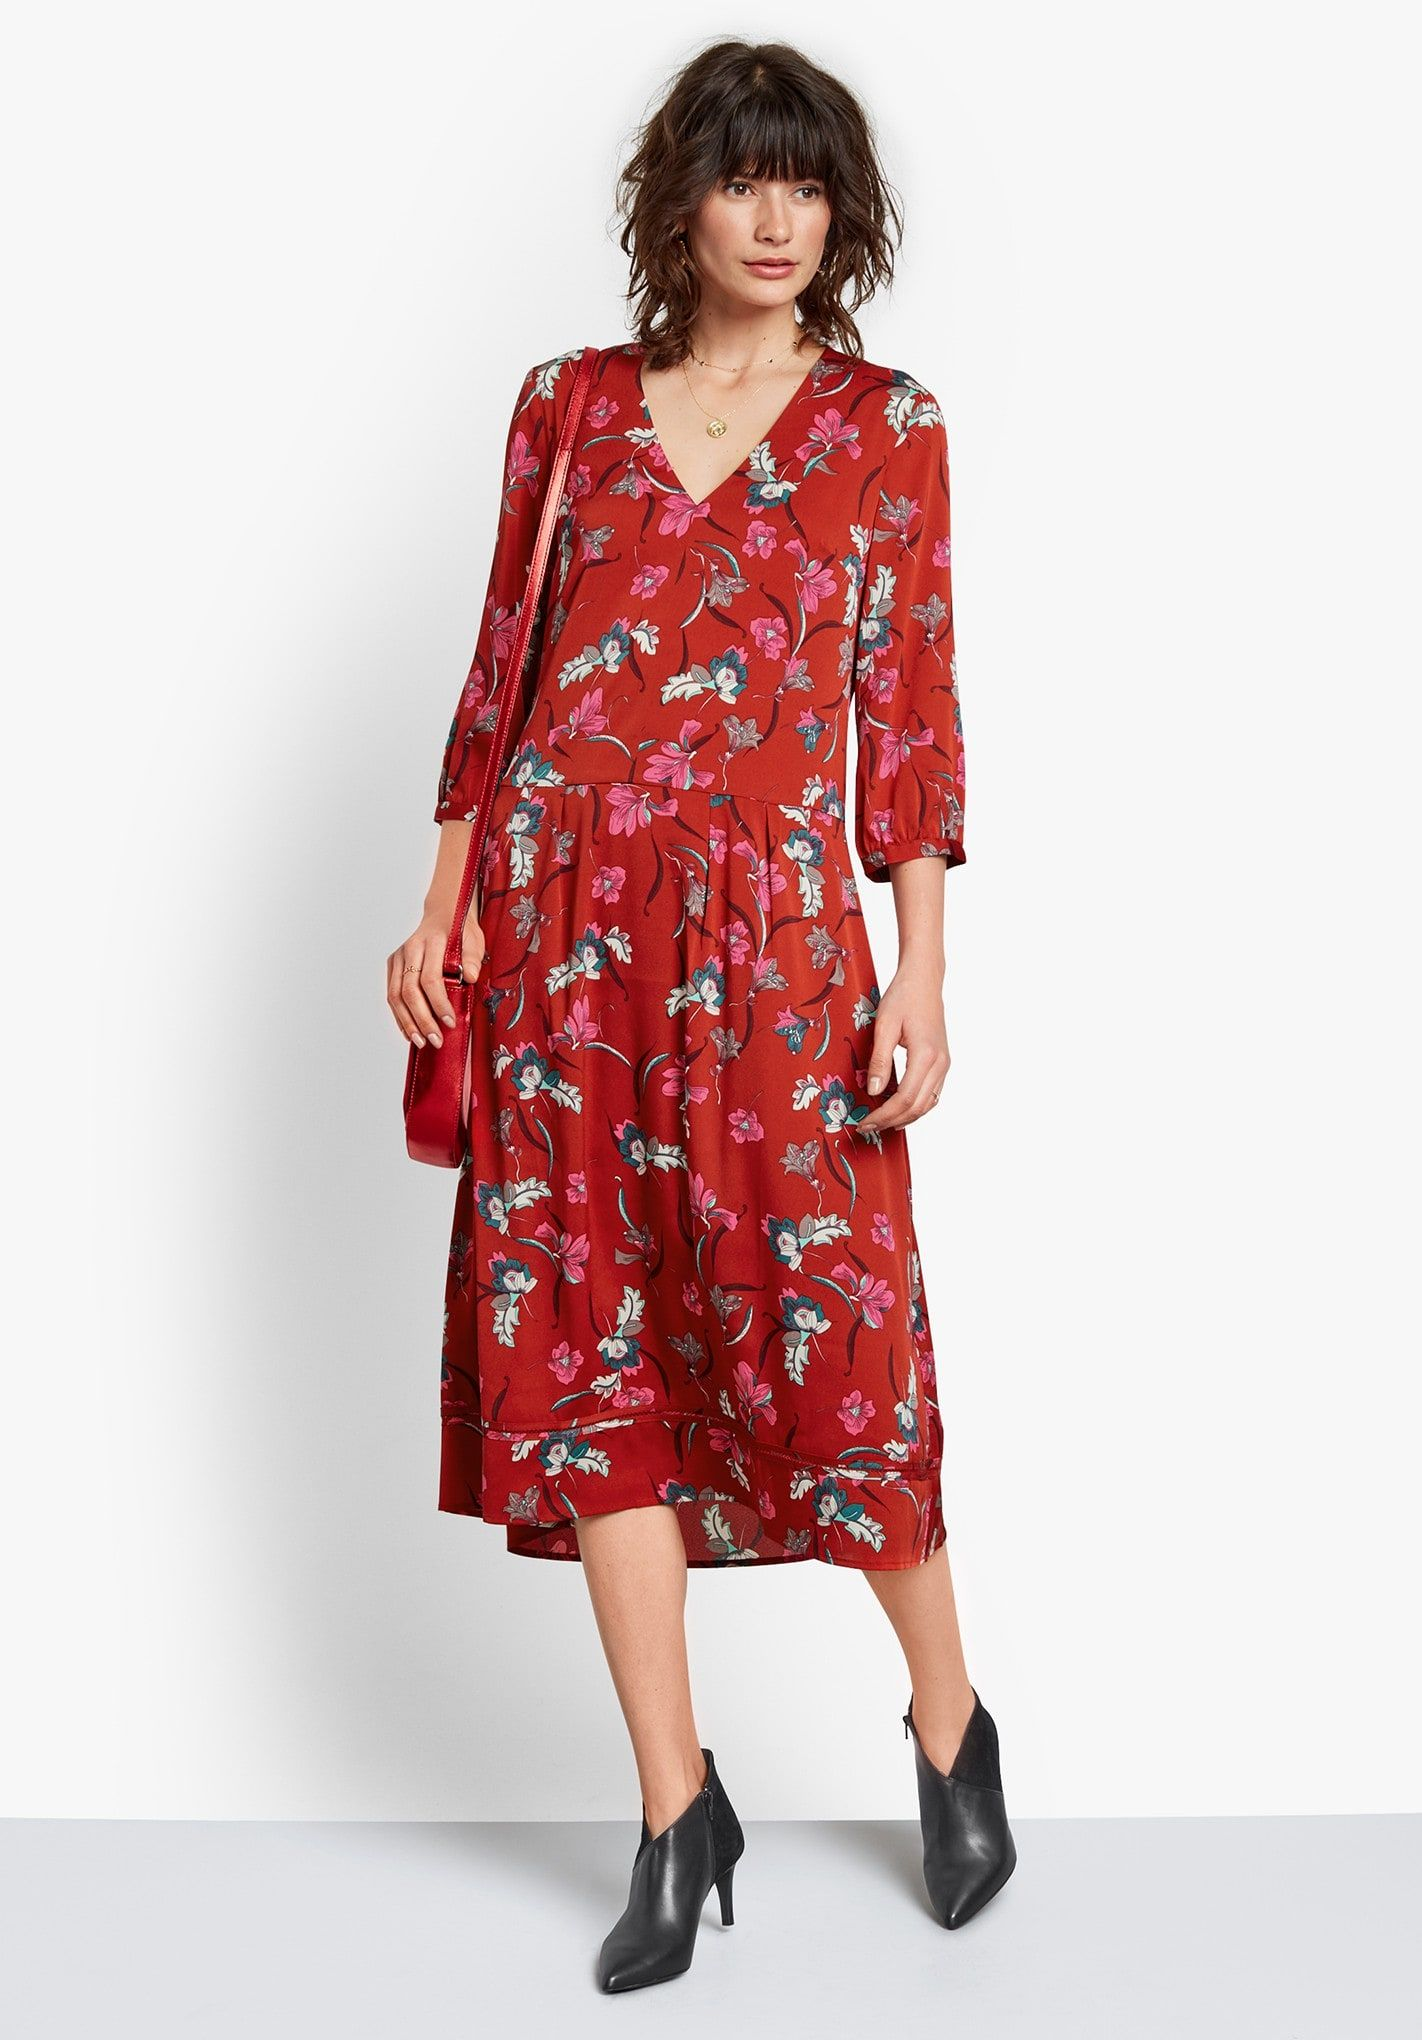 50ad2182ef Buy Liv Midi Dress from Hush  A timeless classic